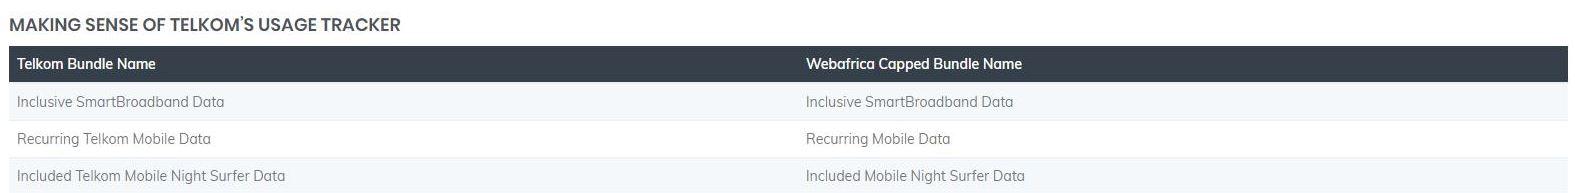 Understanding Your Telkom Fixed Lte Data Breakdown Webafrica Support